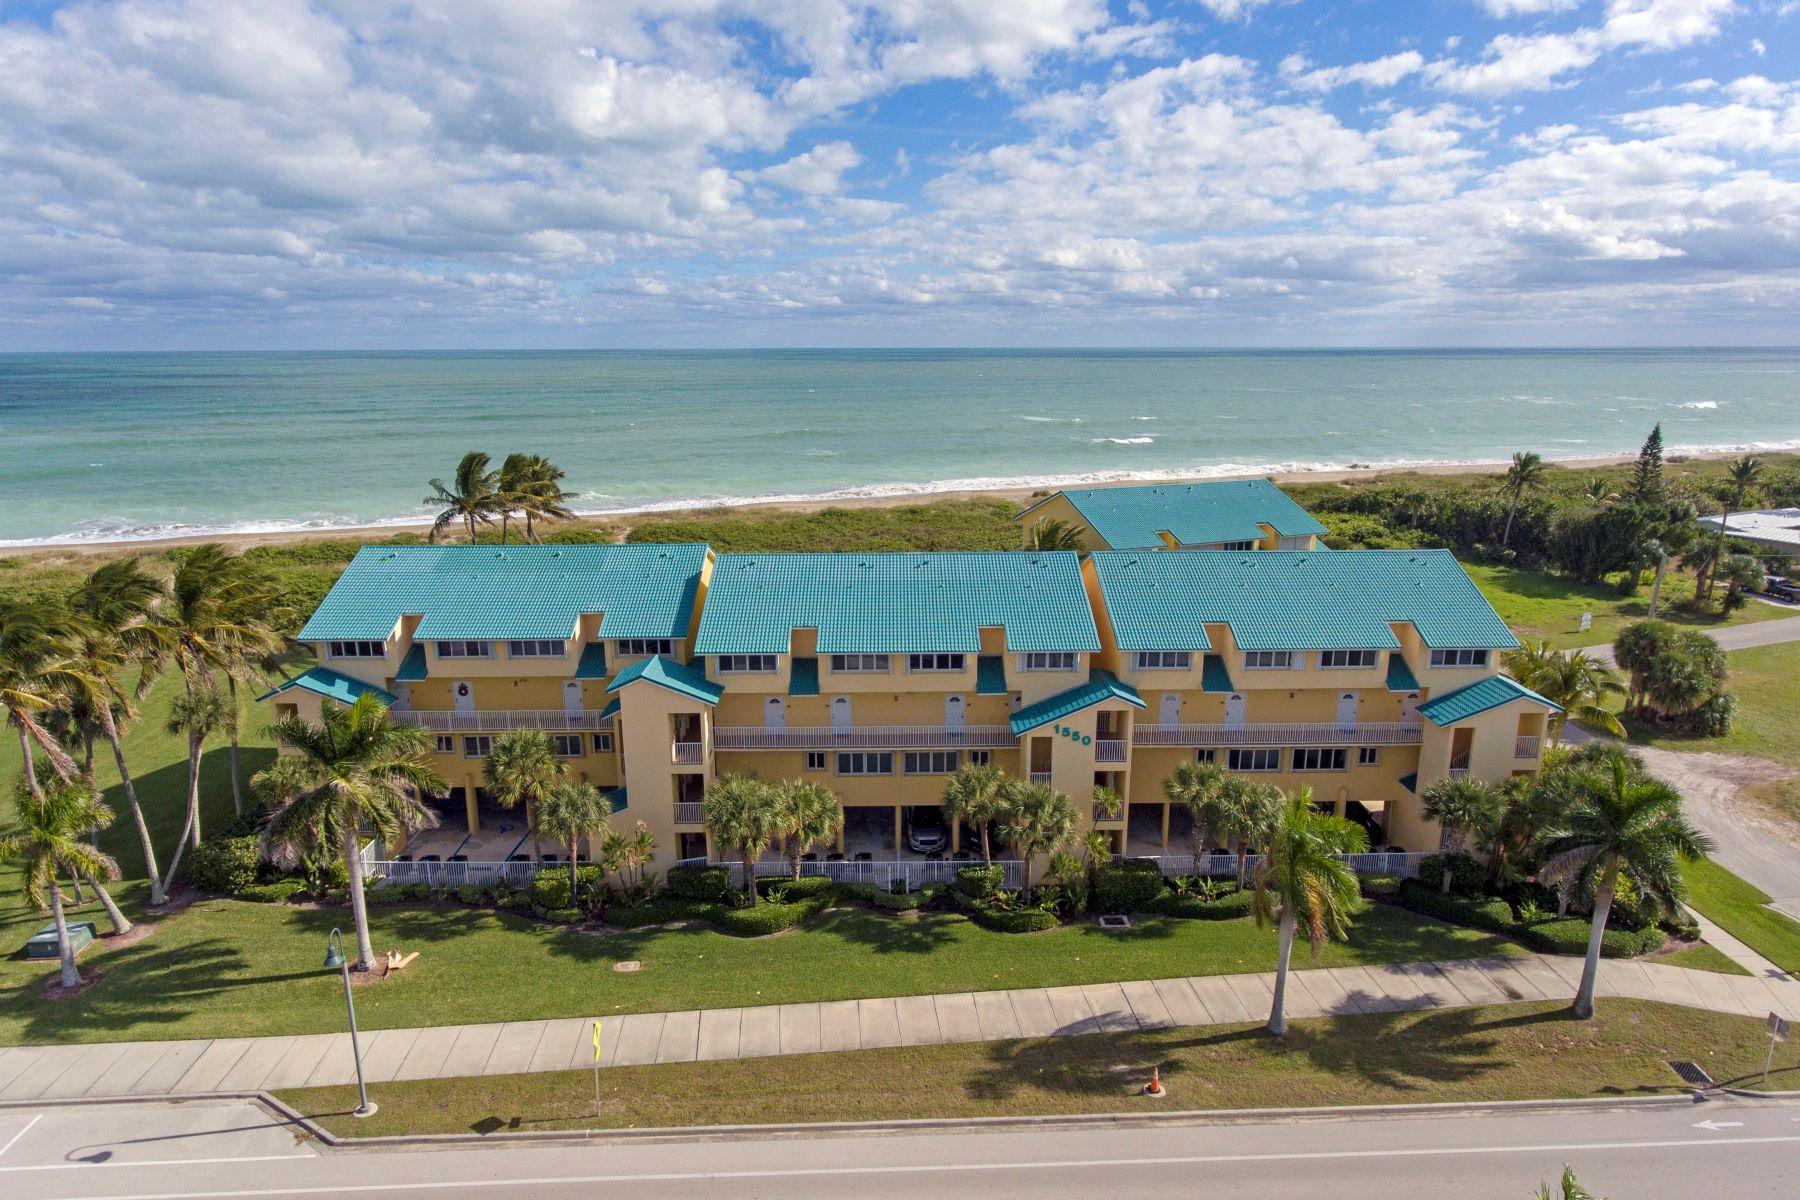 1550 S Ocean Drive 1550 S Ocean Drive A3 Fort Pierce, Florida 34949 Estados Unidos